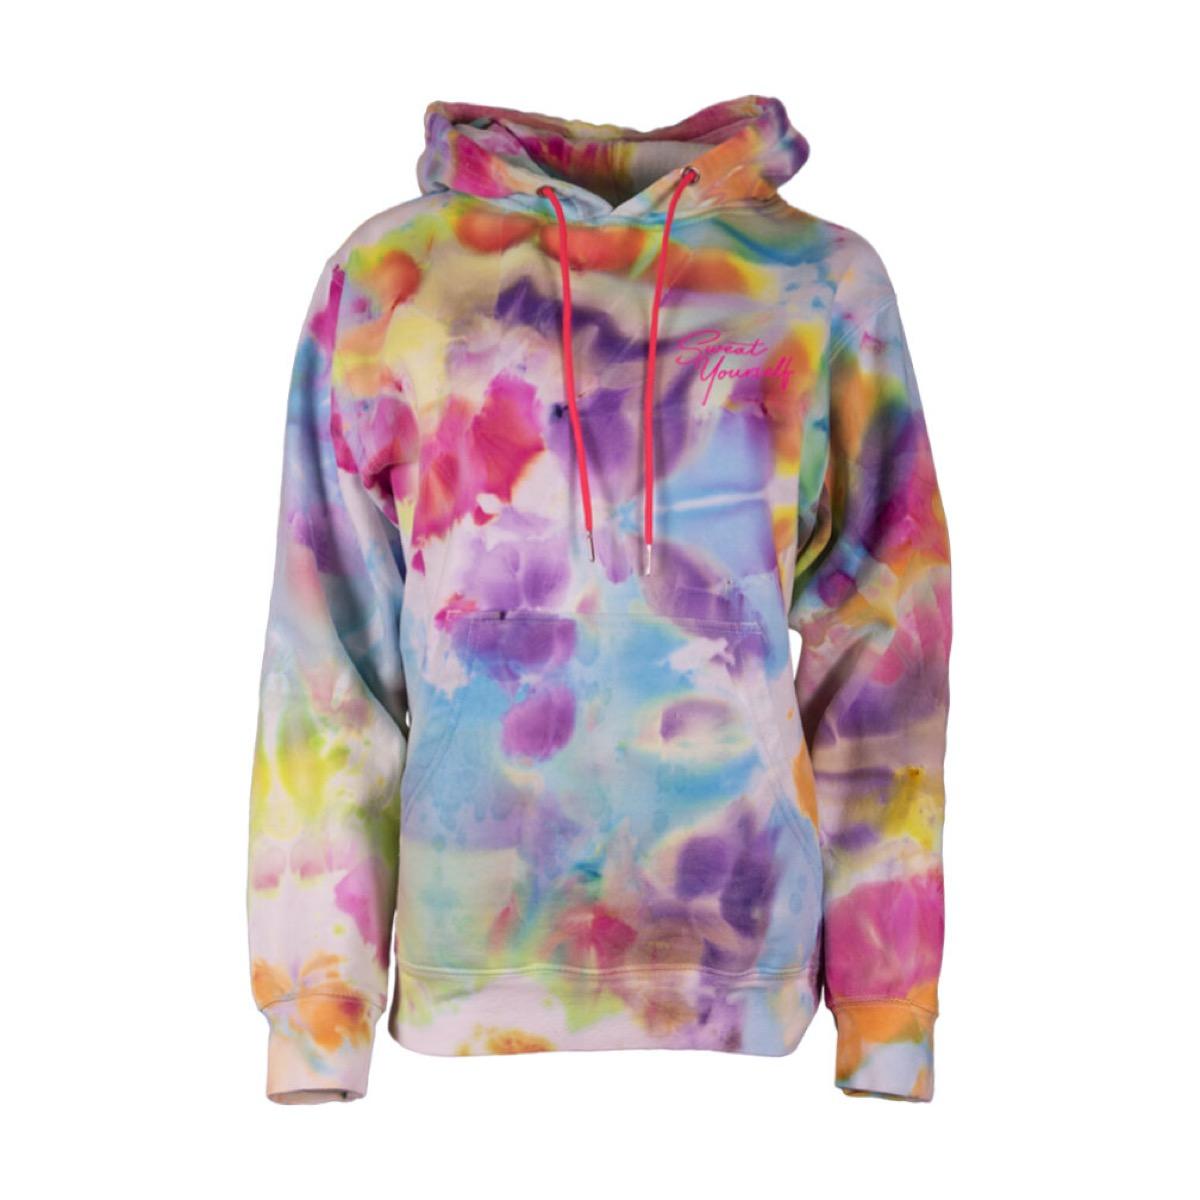 multicolored tie-dyed hooded sweatshirt